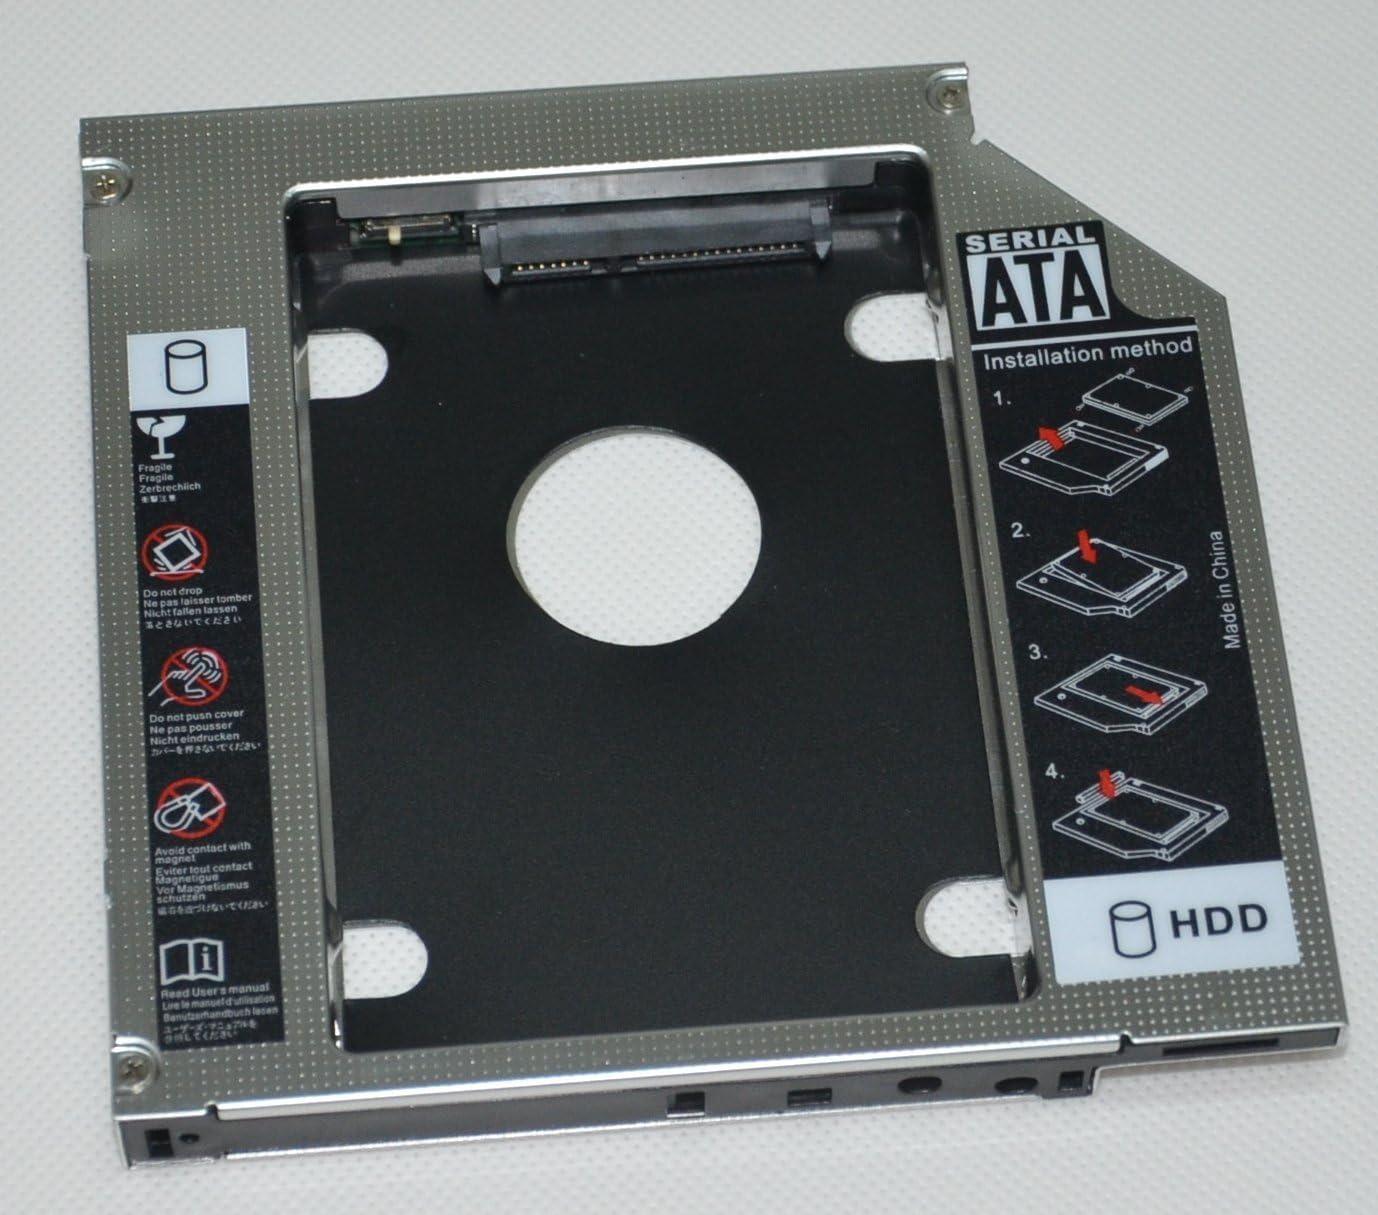 Deyoung 2nd Hard Drive HDD SSD Caddy for Sony VAIO VPCEB26FG VPCEB2E1R VPCF13z1e VPCF22C5E